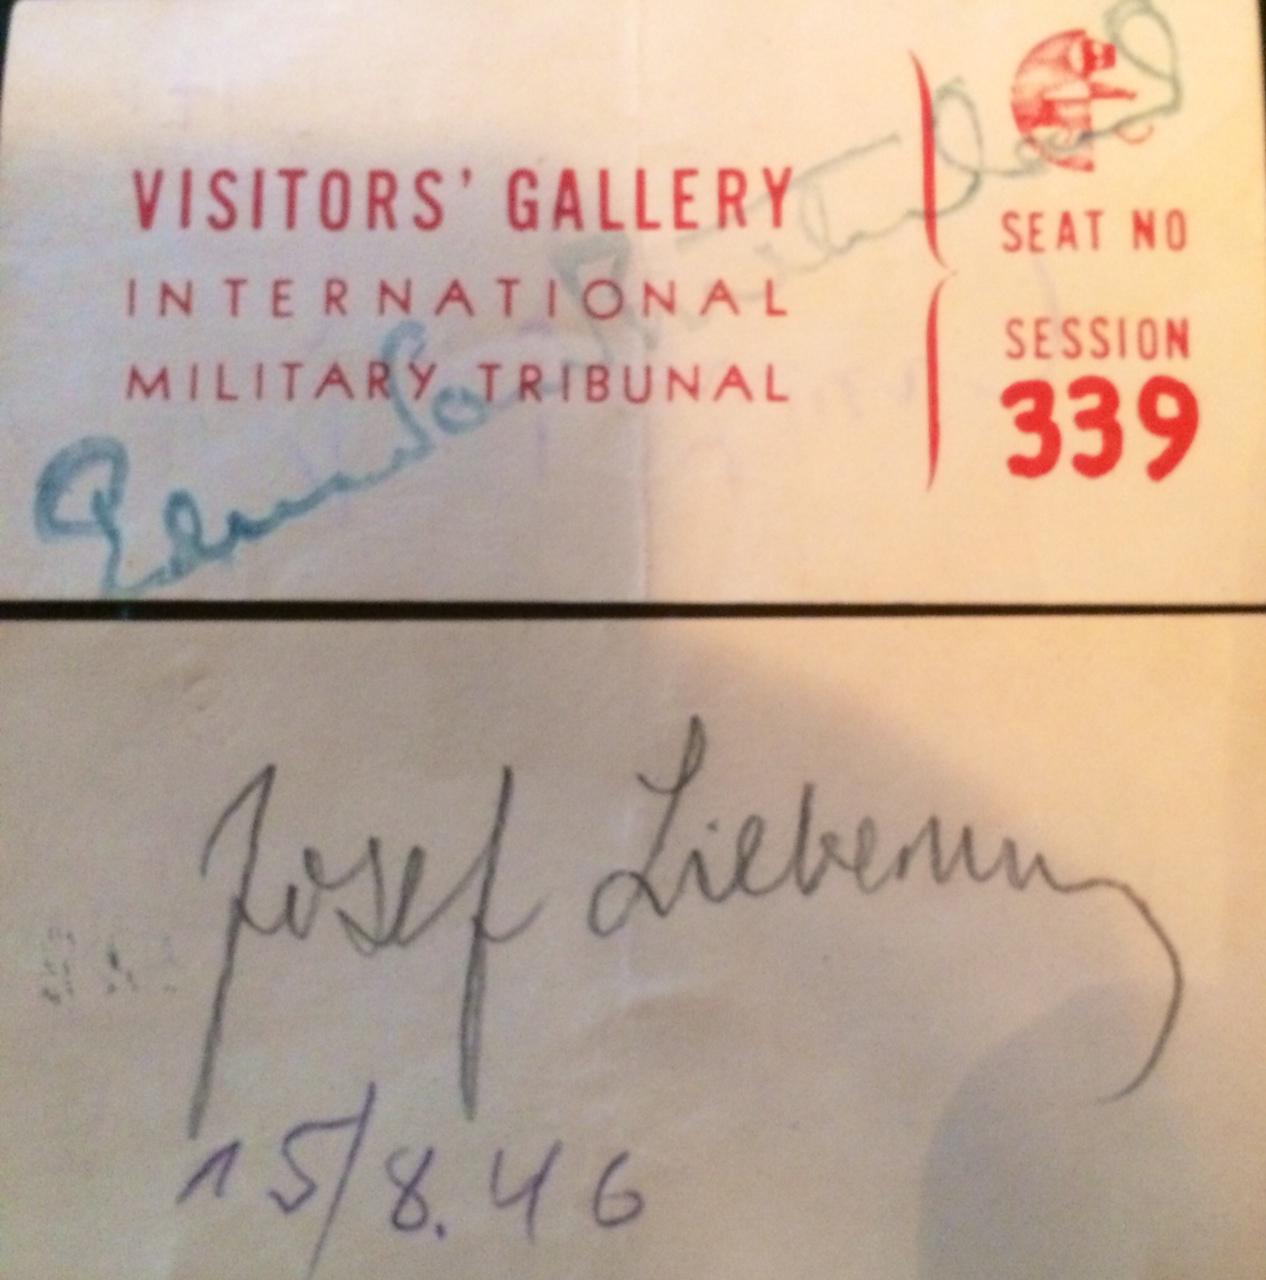 Ticket to Nuremberg Trials August 15, 1946, Session 339